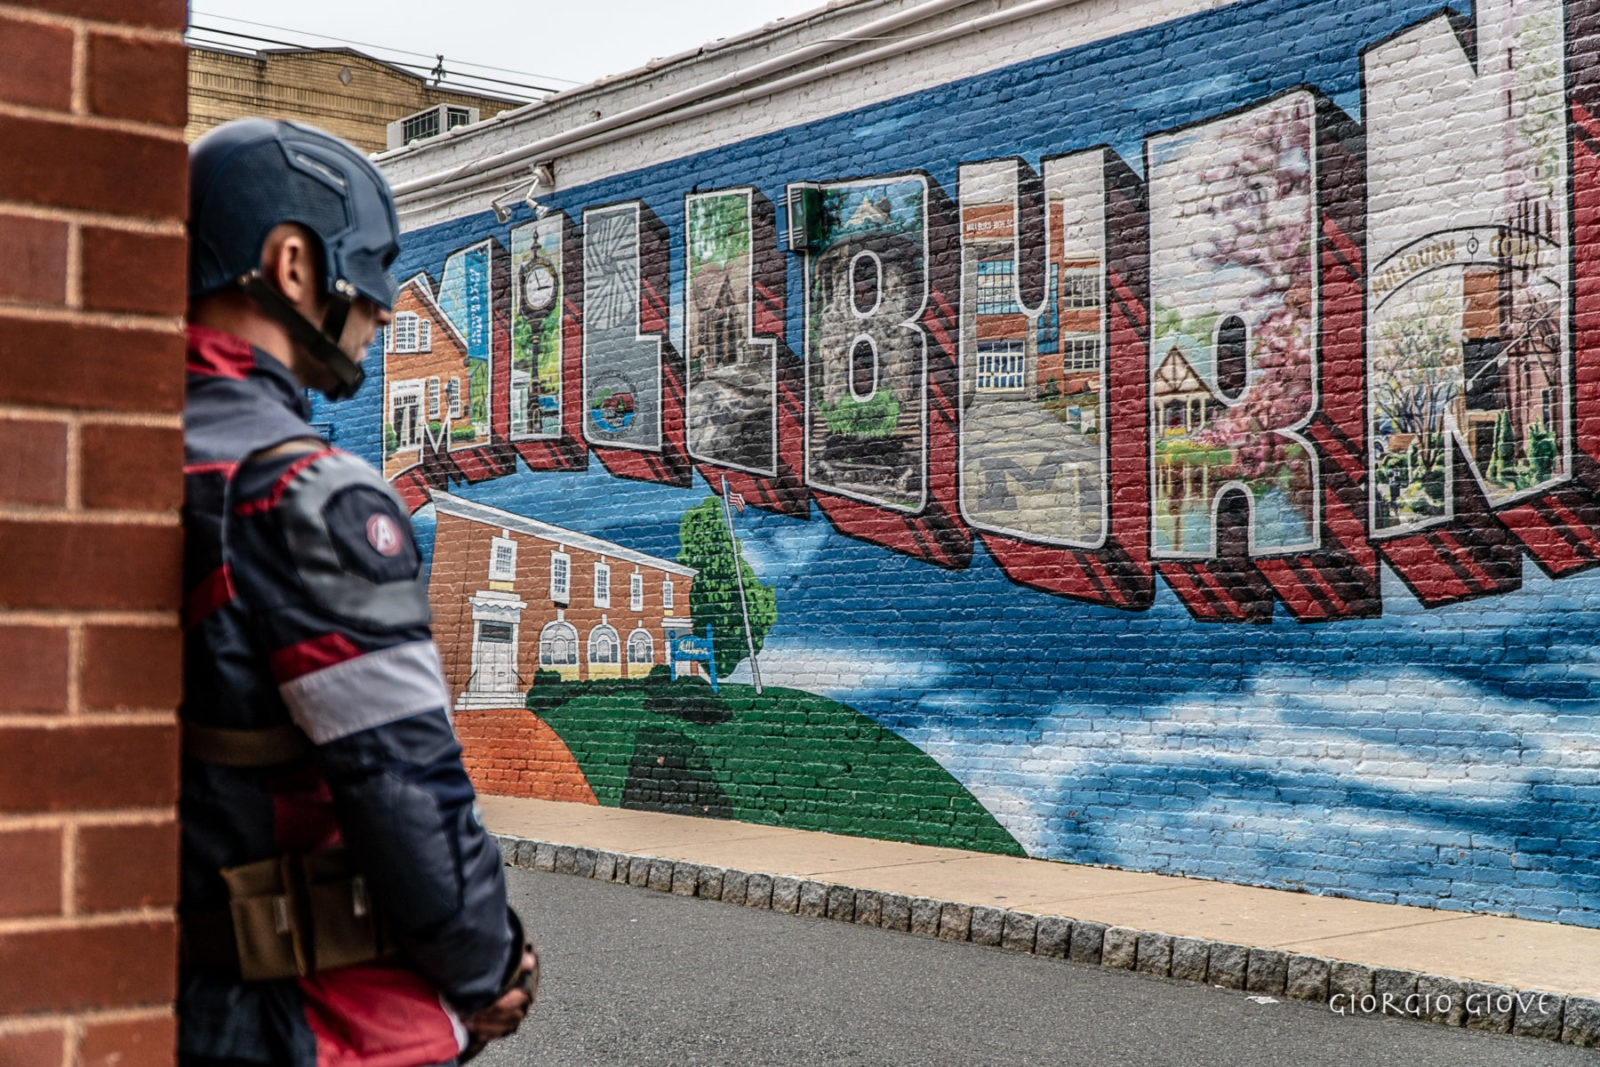 Captain America visits Millburn